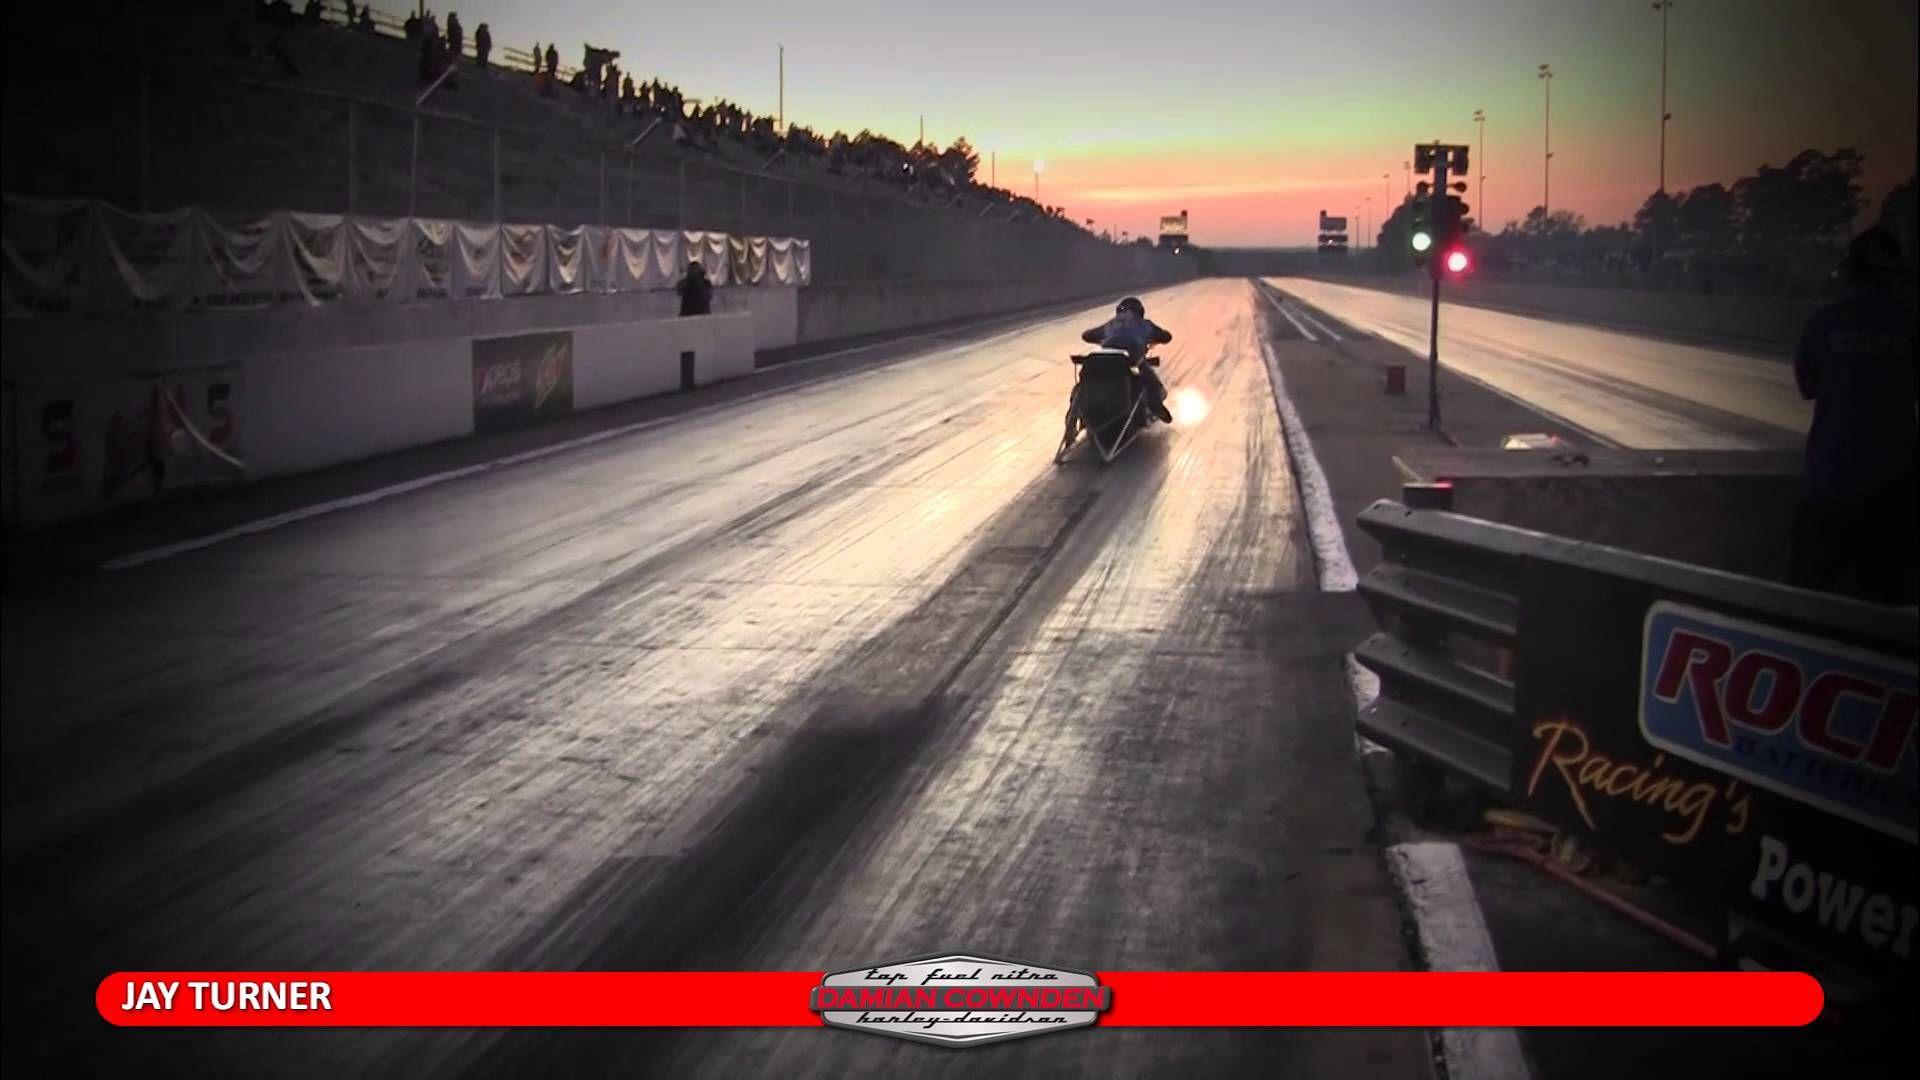 Damian Cownden Top Fuel Nitro HarleyDavidson Harley